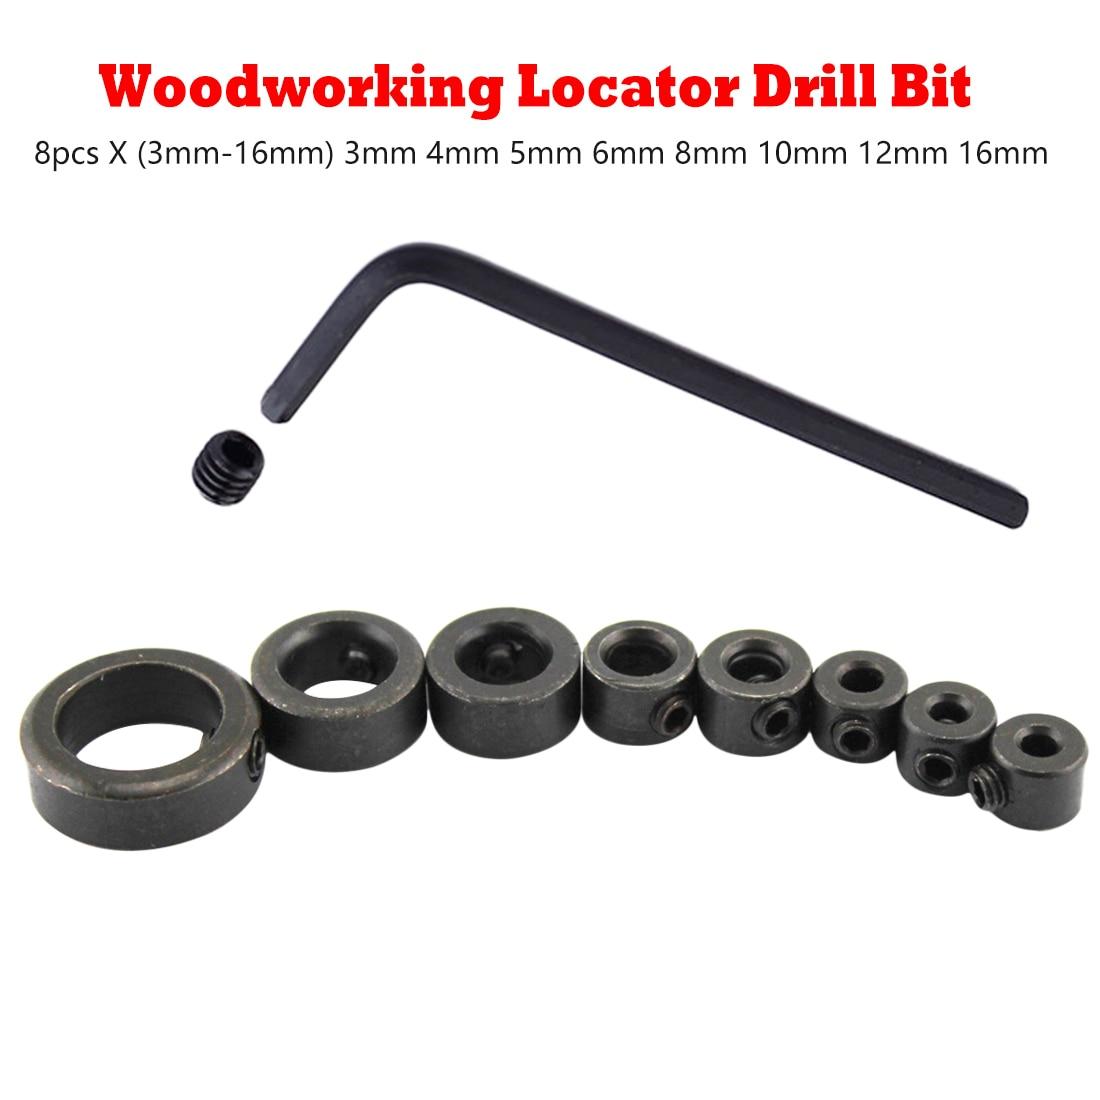 Locator Wood Drill Bit 8pcs 3-16mm Woodworking Drill Locator Drill Bit Depth Stop Collars Ring Positioner Drill